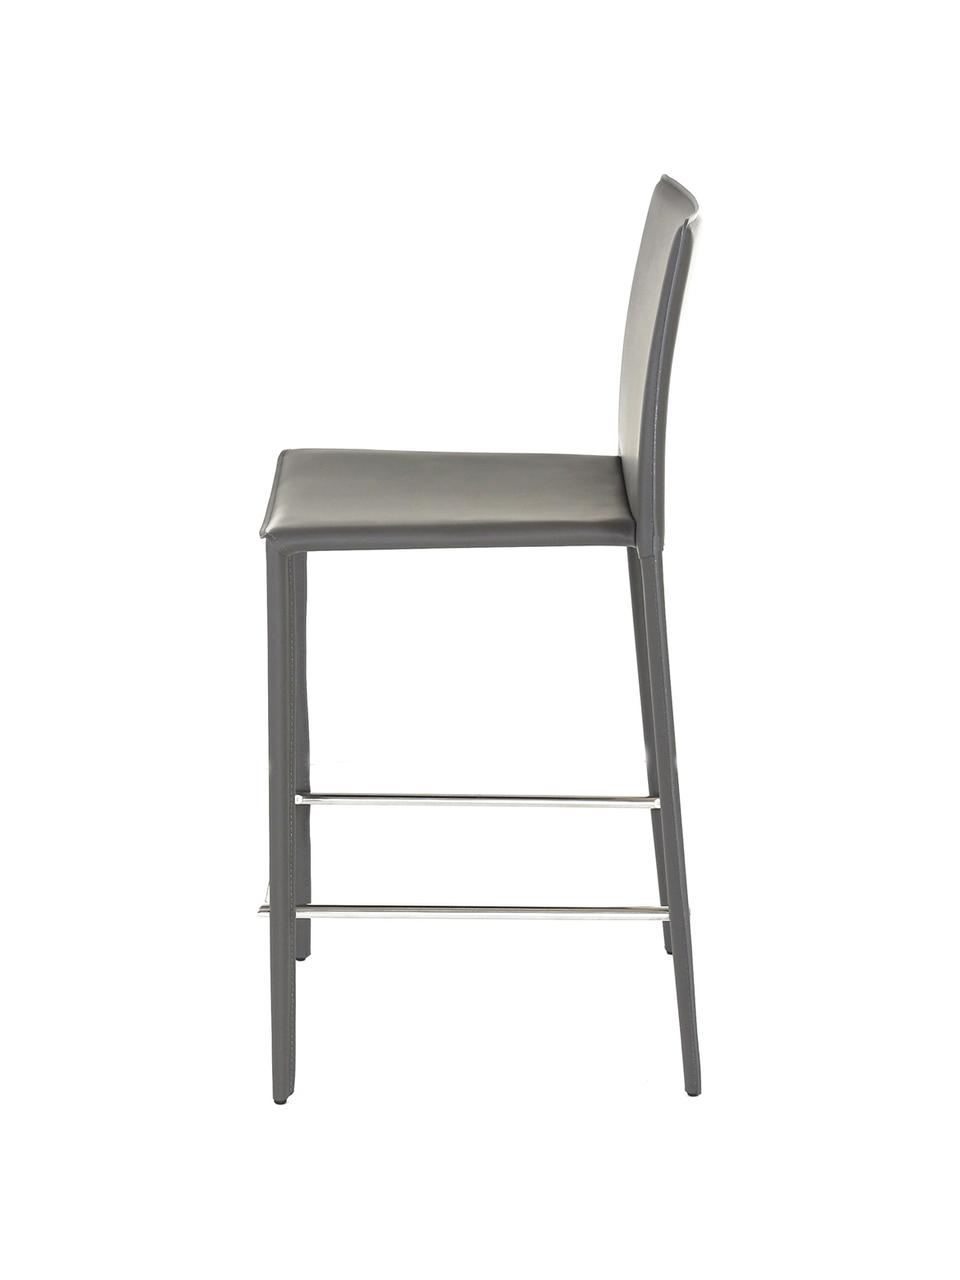 Sedia da bar in pelle Boréalys 2 pz, Seduta: pelle riciclata (70% pell, Struttura: metallo verniciato a polv, Grigio, Larg. 44 x Alt. 98 cm